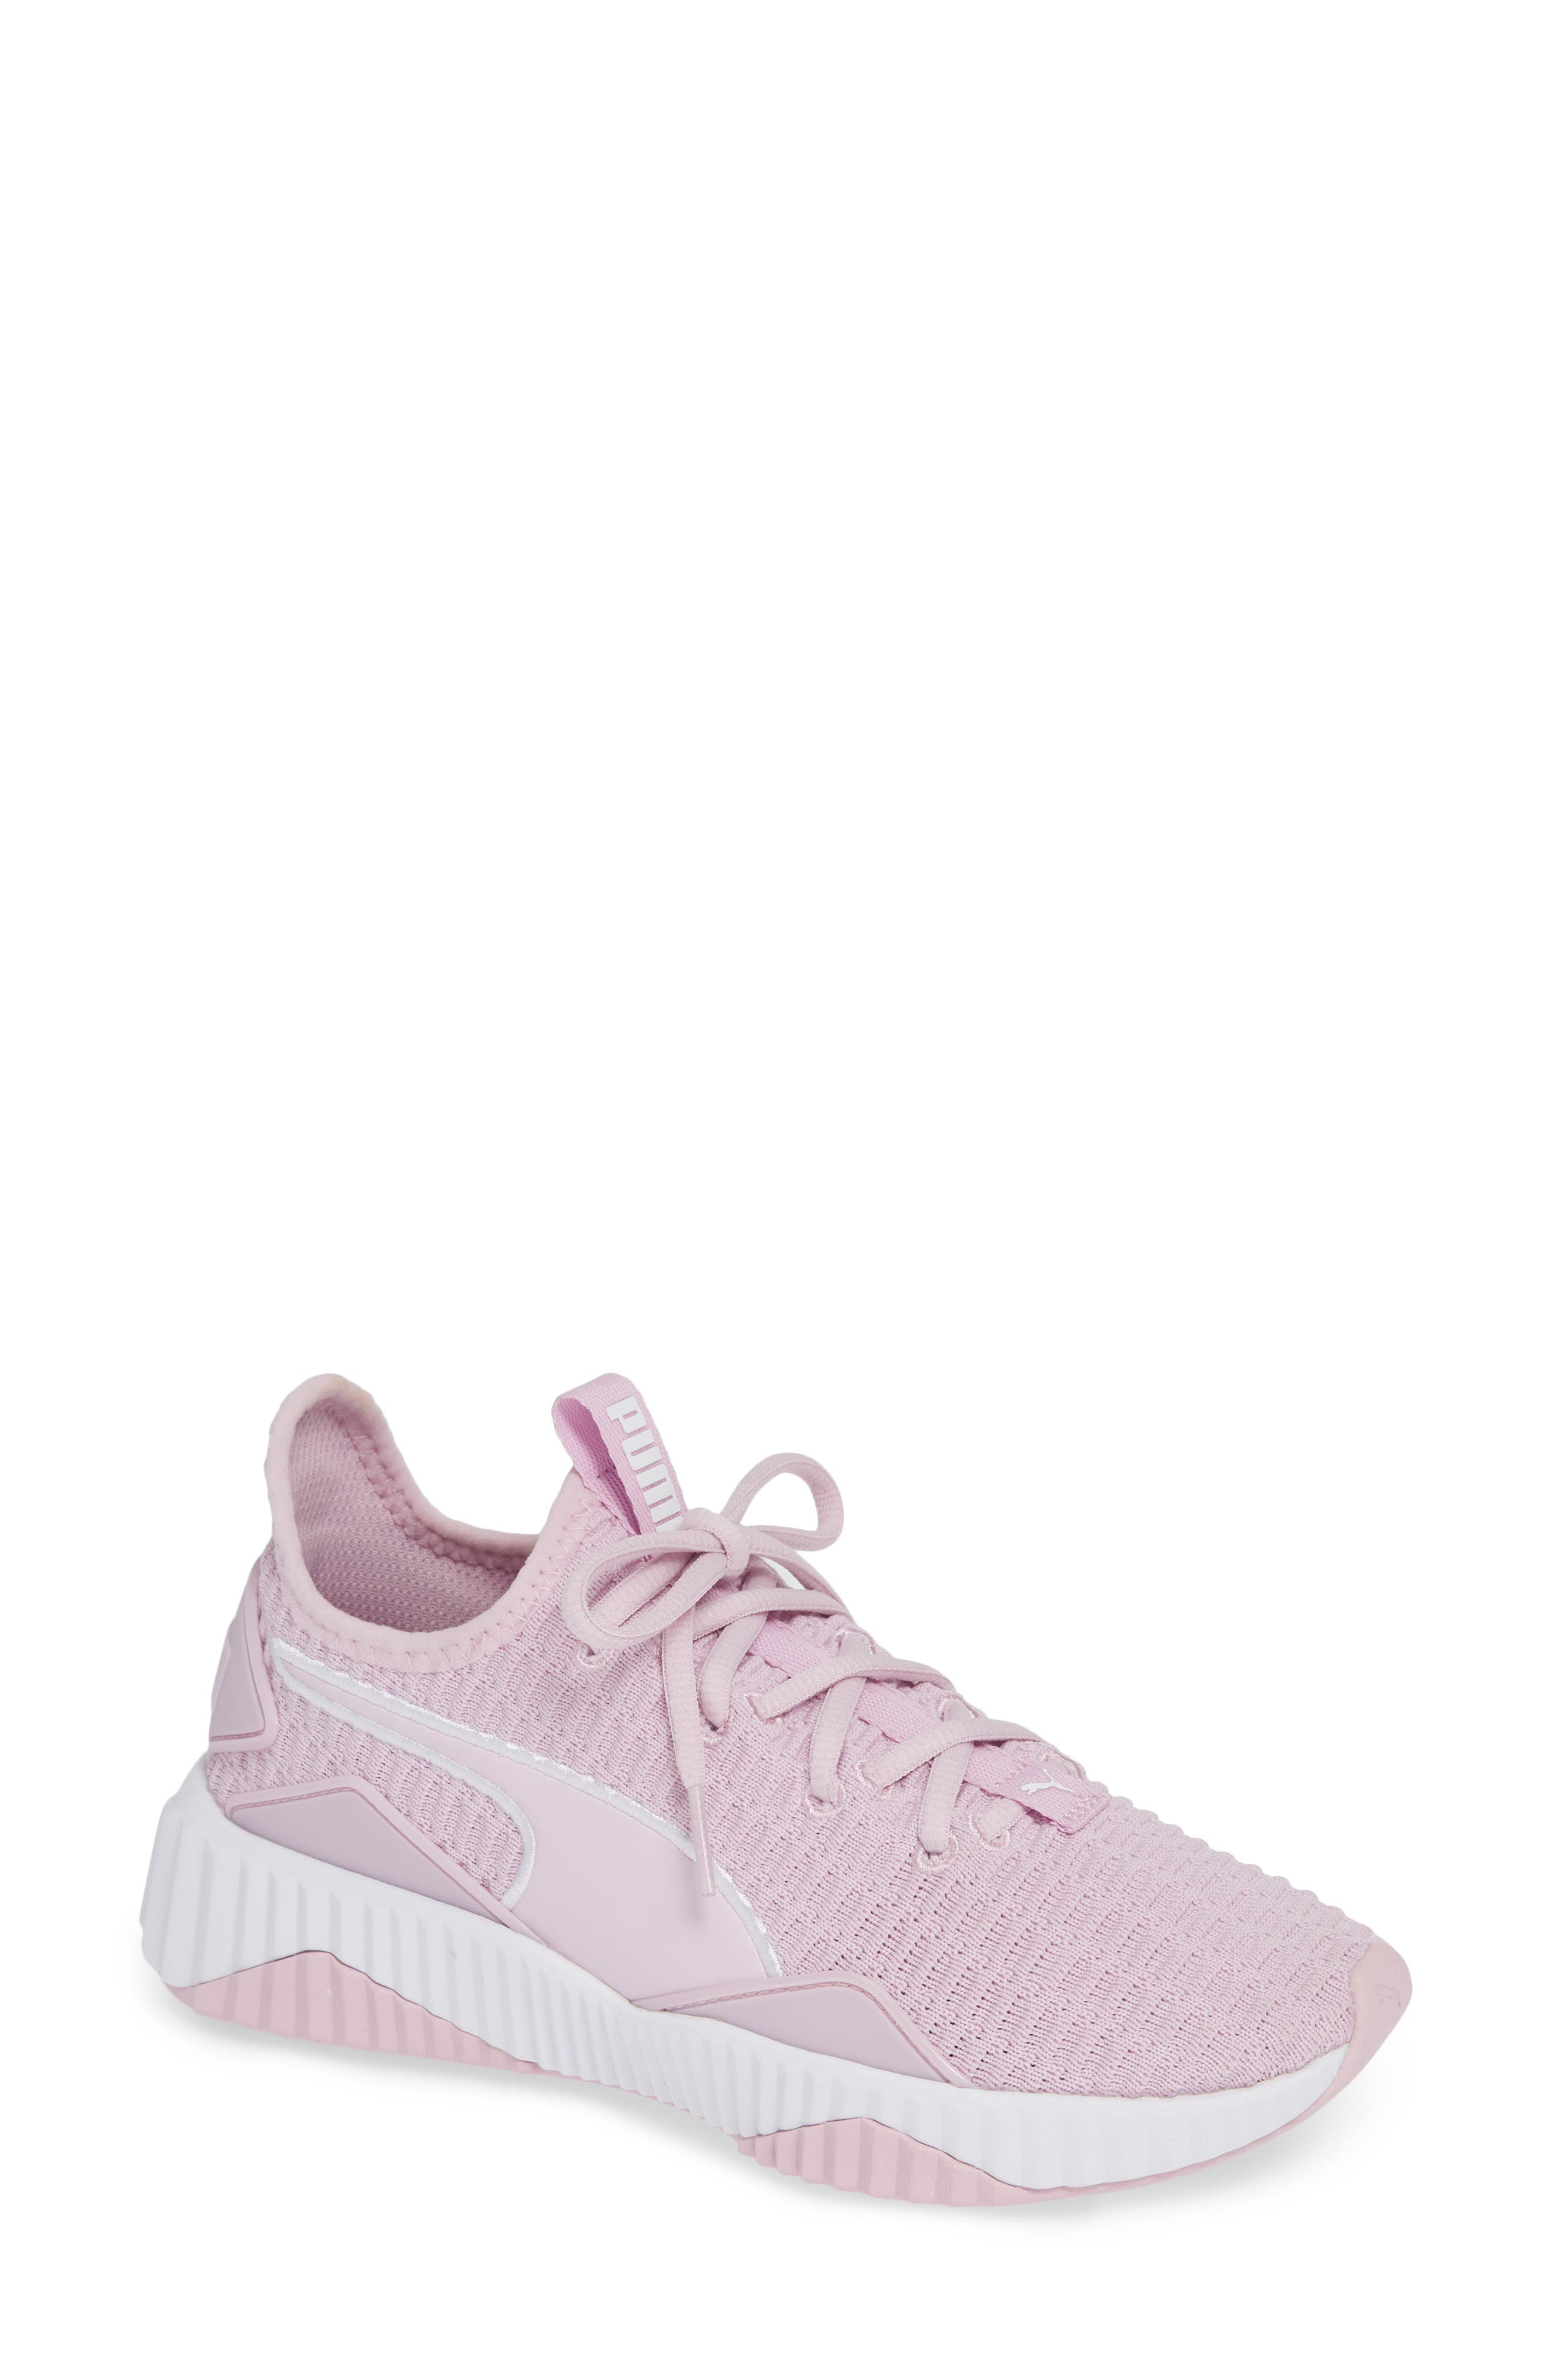 Defy Sneaker,                         Main,                         color, WINSOME ORCHID/ PUMA WHITE